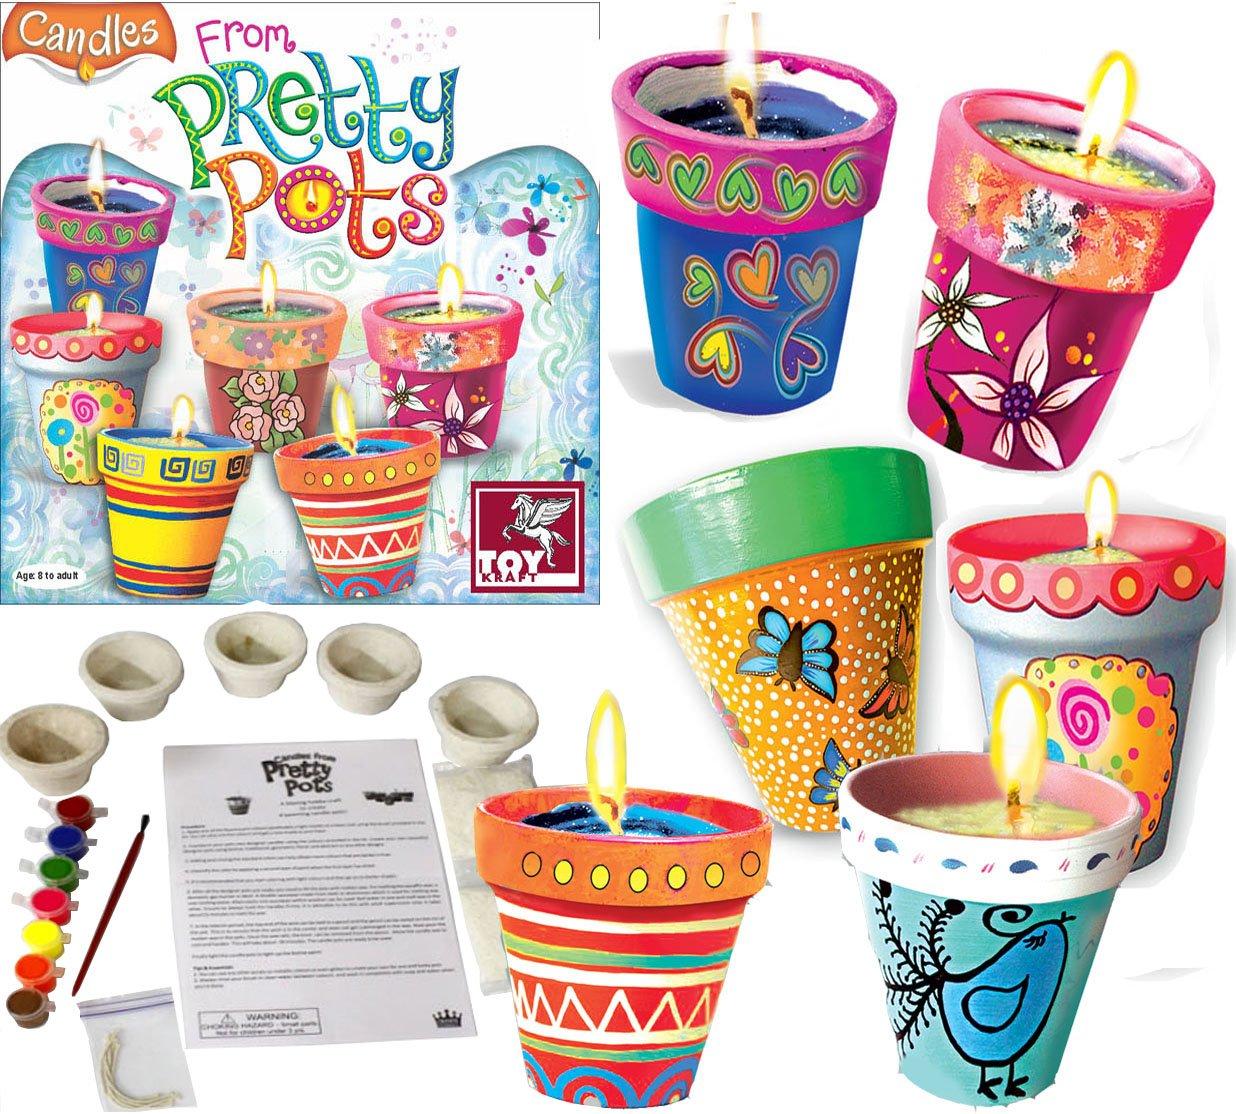 Ceramic Plant Pot Painting Candle Making Kit  Unique Girls Hobby Craft Gift Set Birthday Chrismtas Present Toykraft 39469